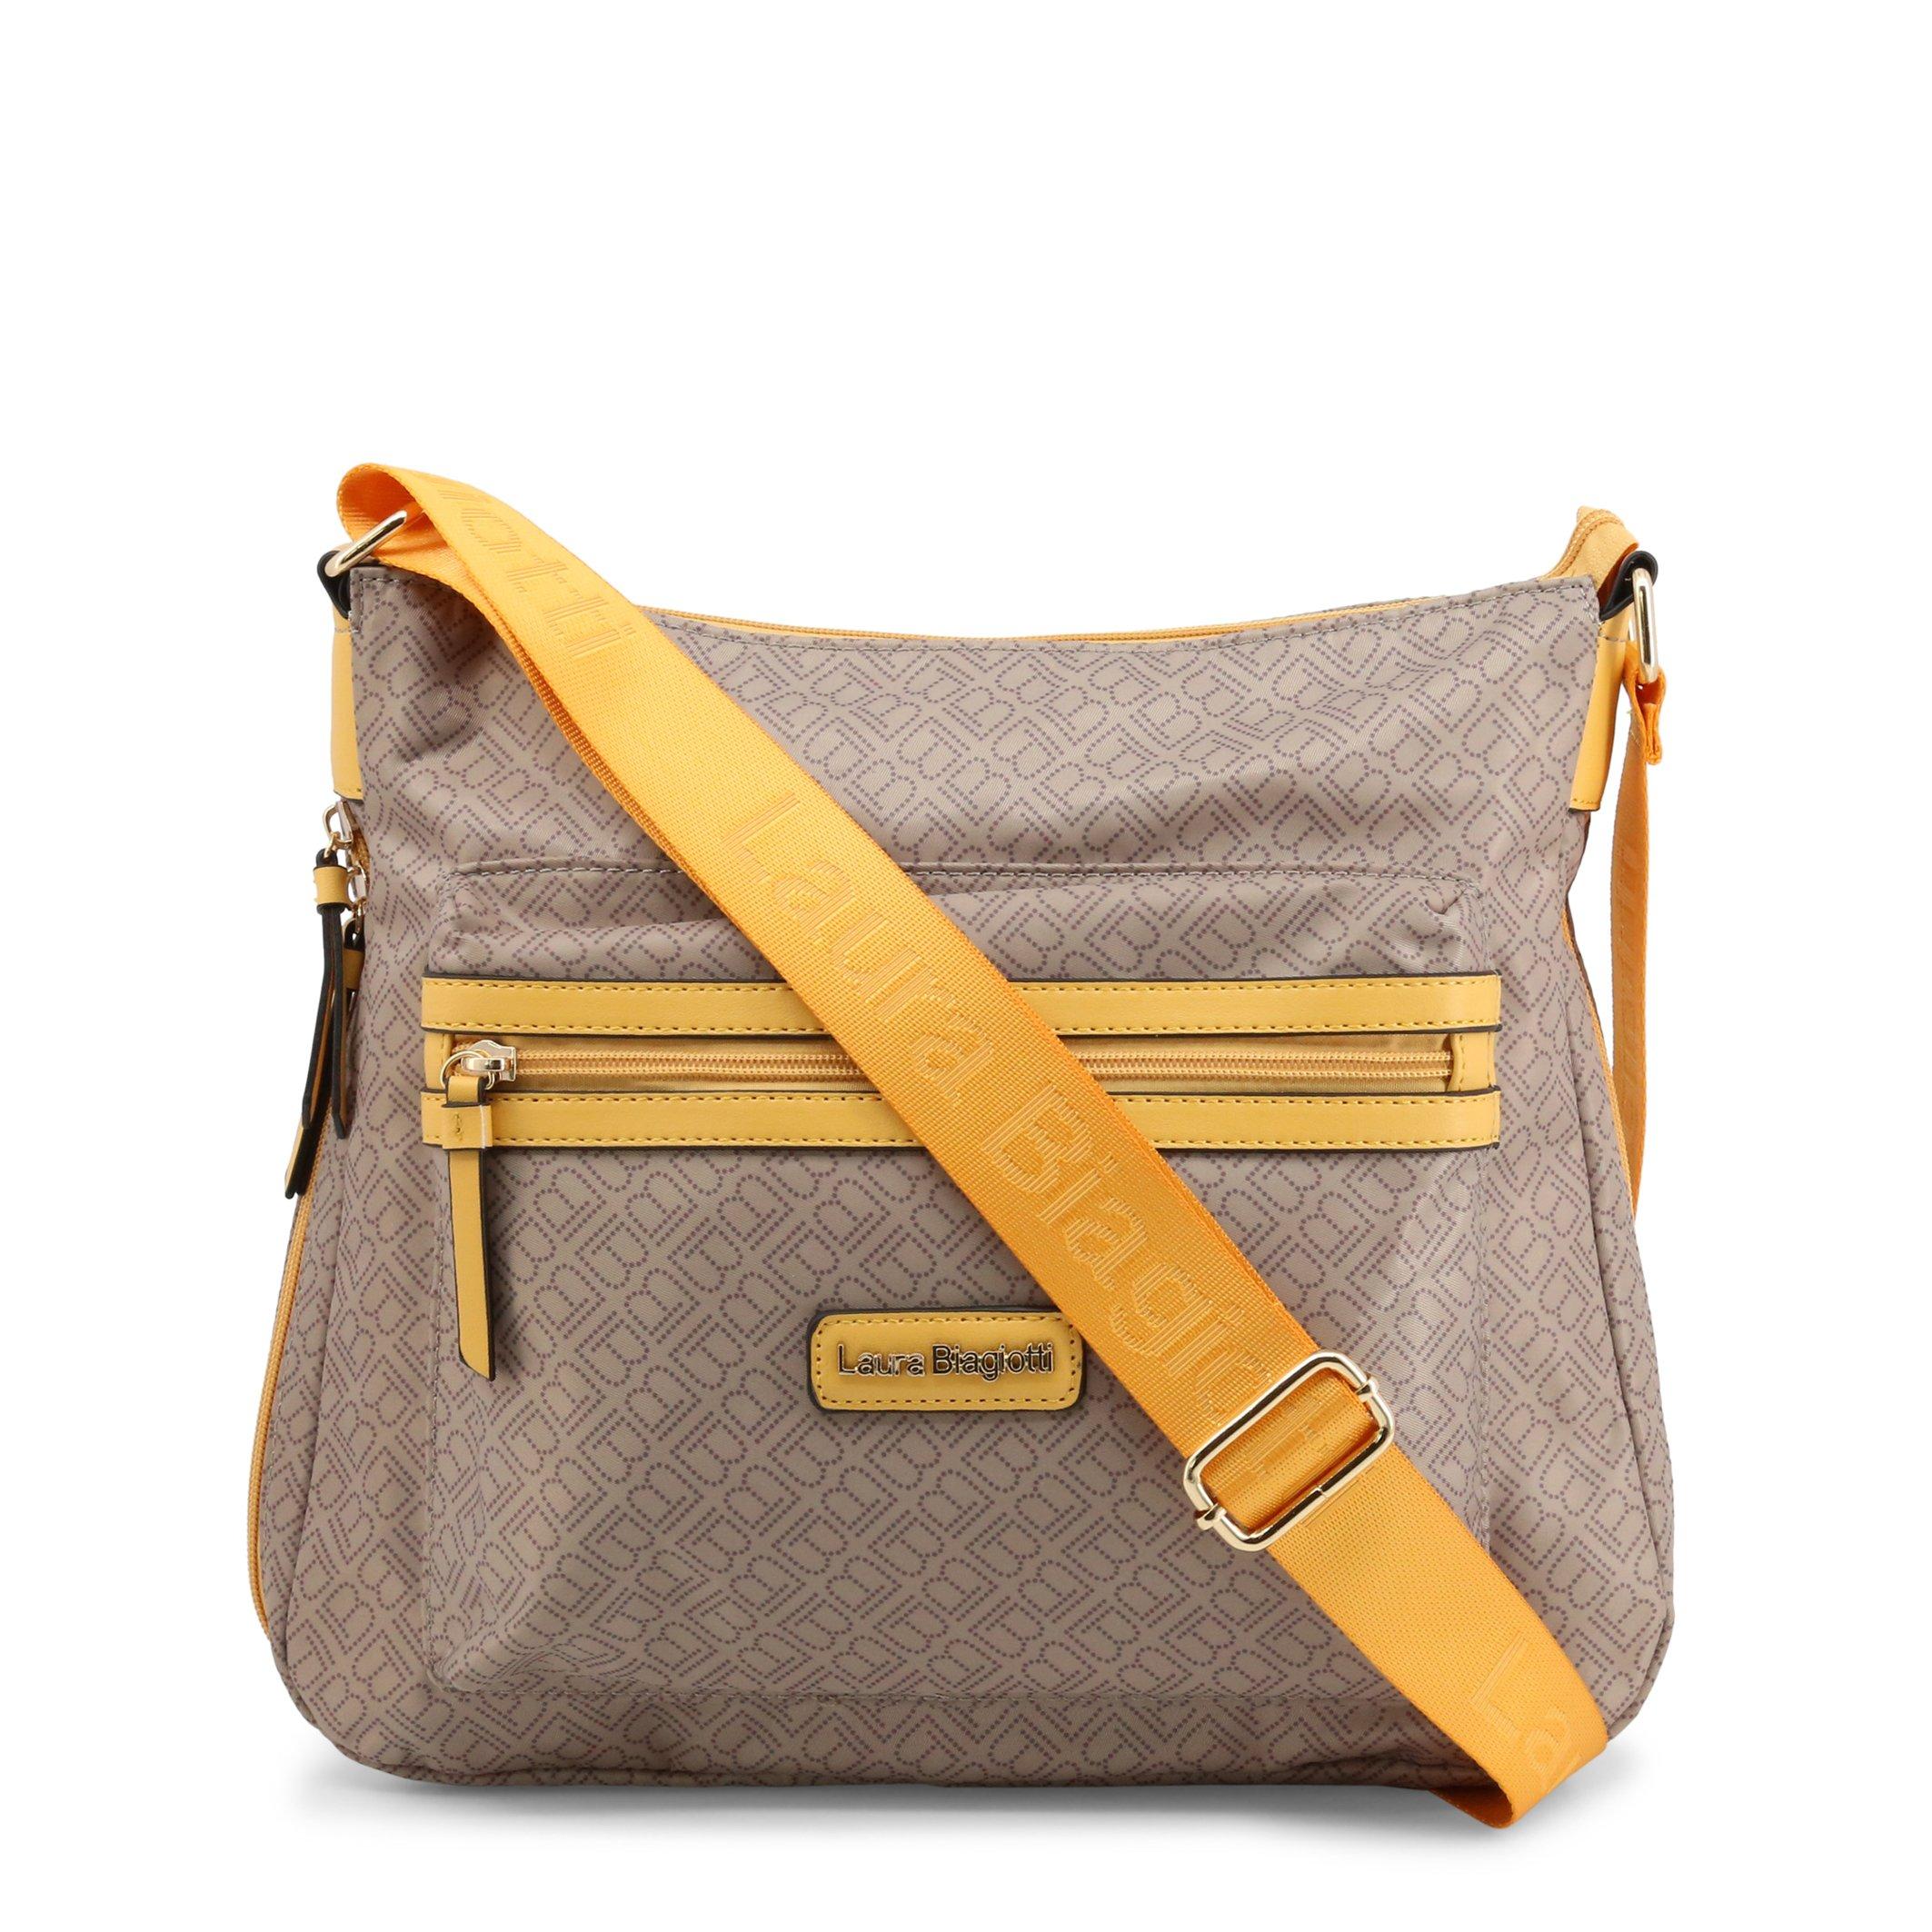 Laura Biagiotti Women's Crossbody Bag Brown Thia-105-10 - brown-1 NOSIZE